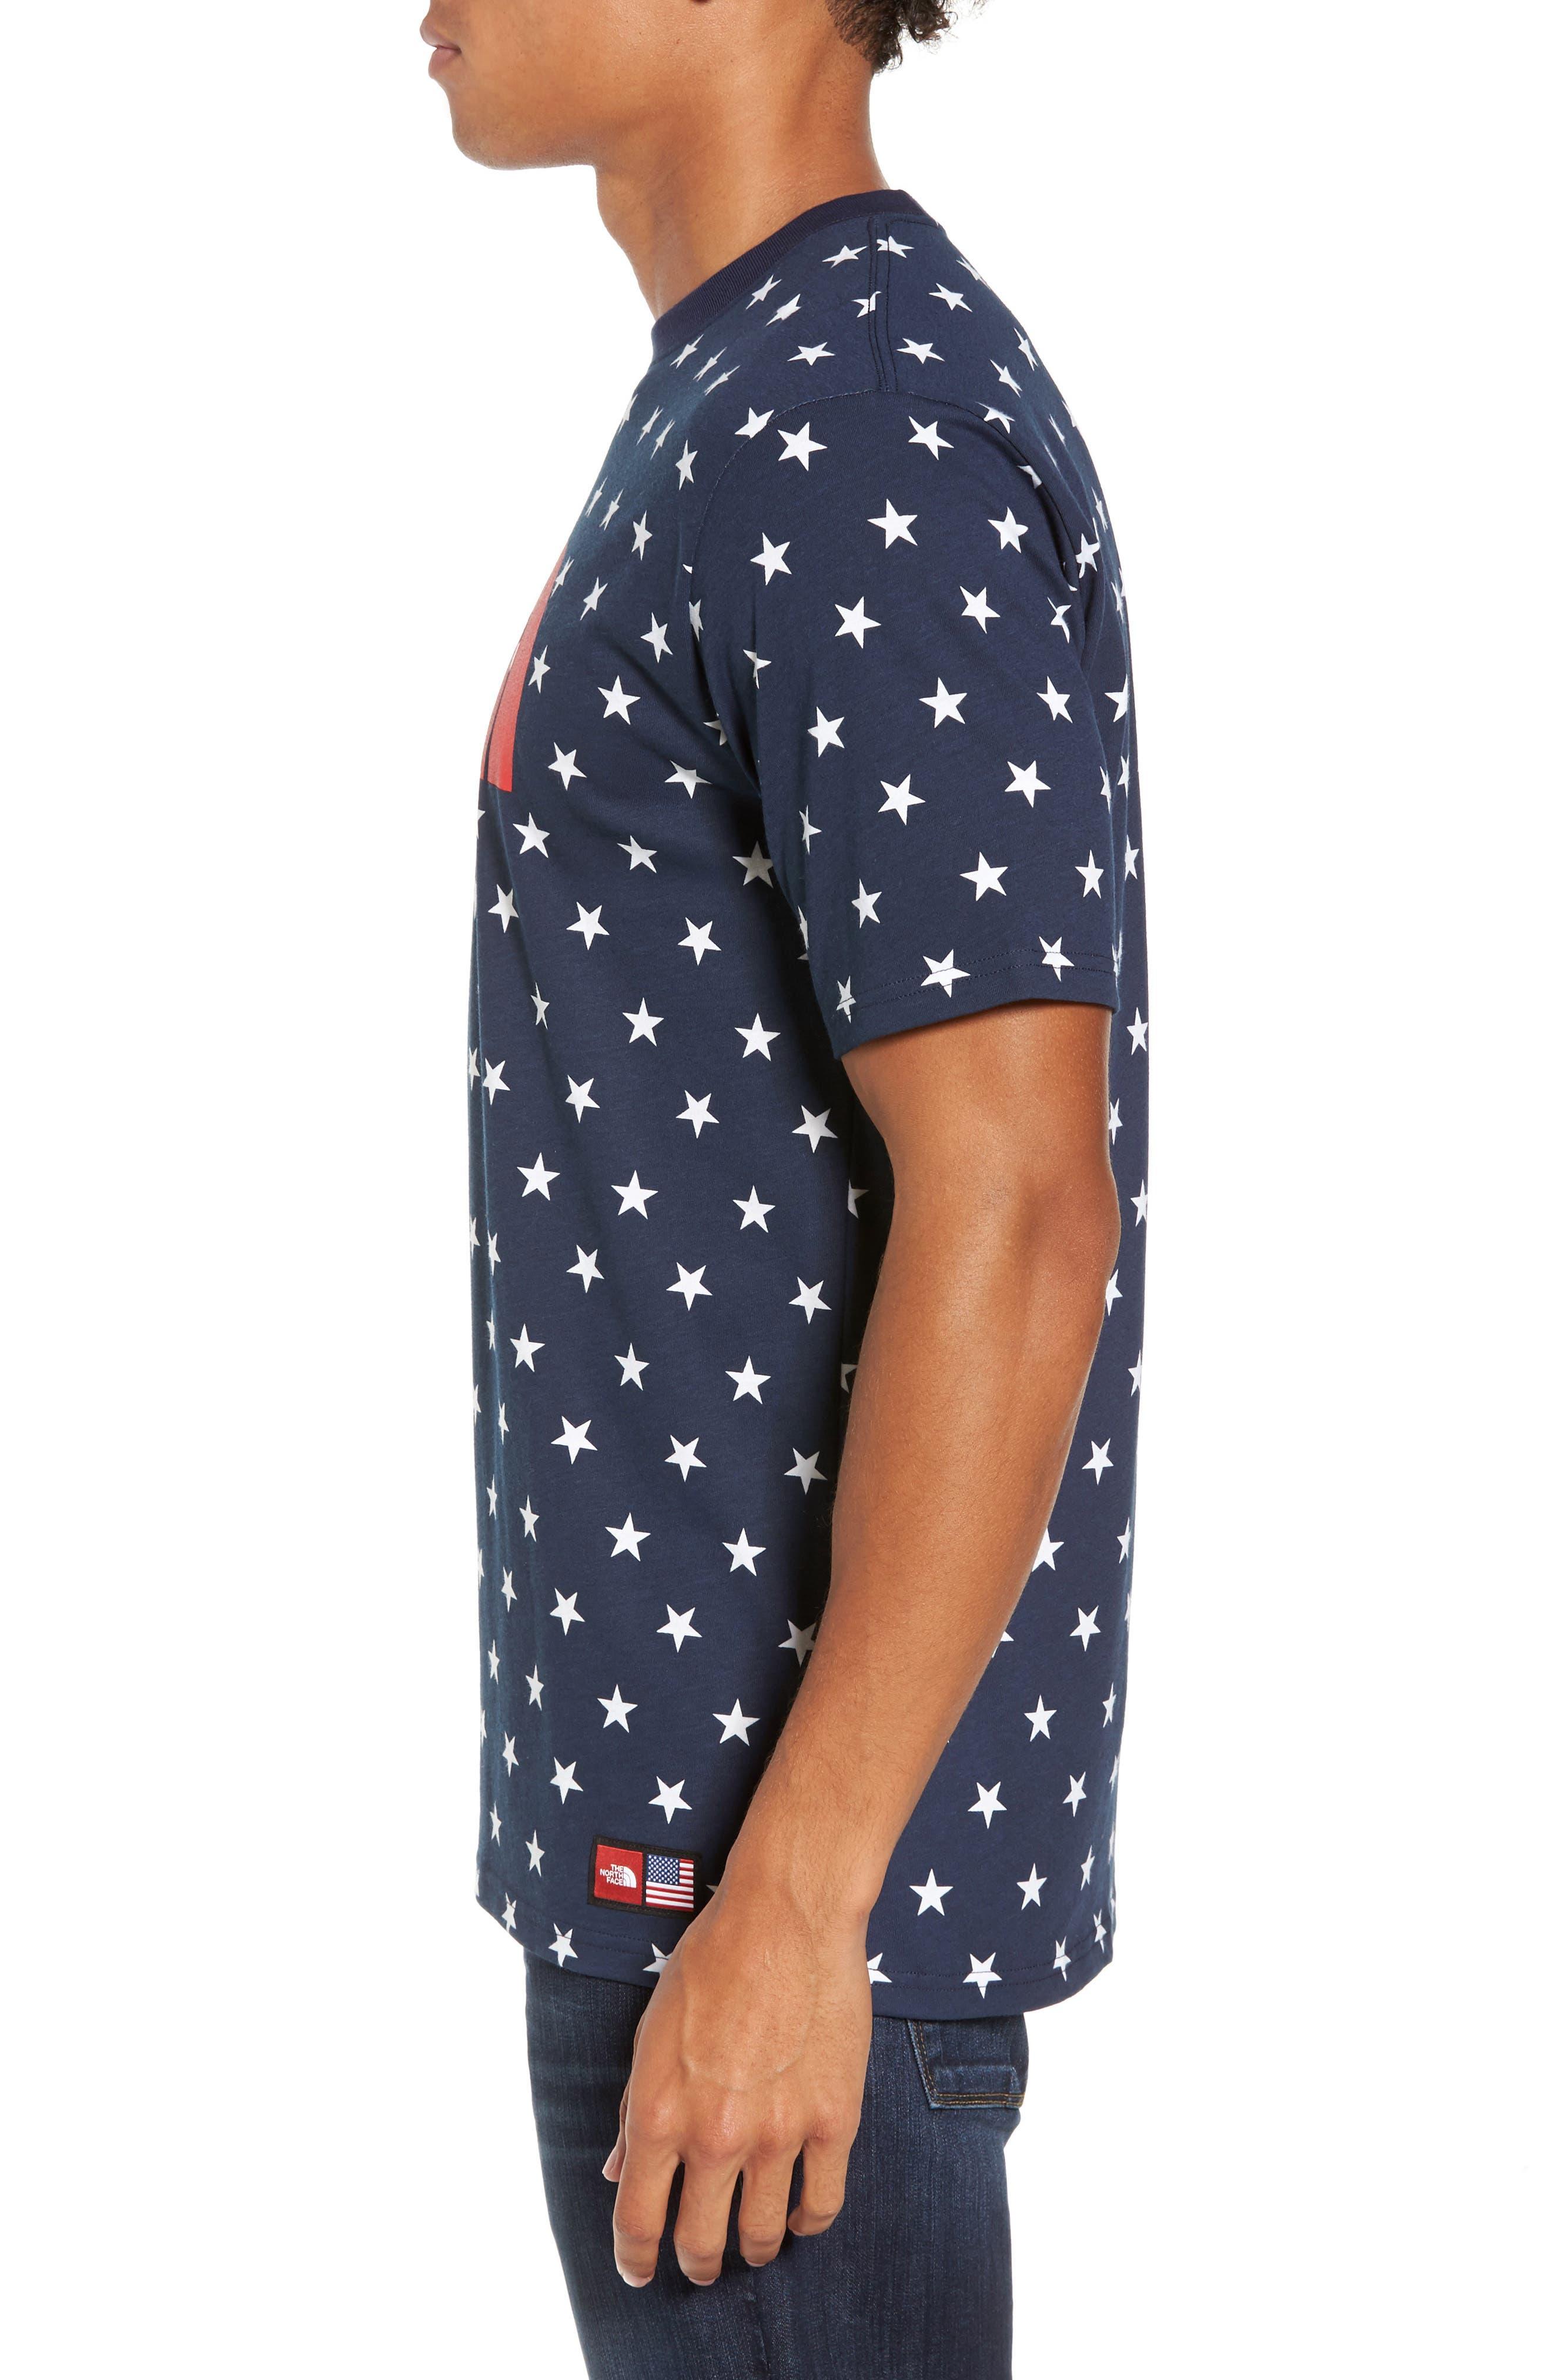 International Collection Star Print T-Shirt,                             Alternate thumbnail 3, color,                             Cosmic Blue Star Print